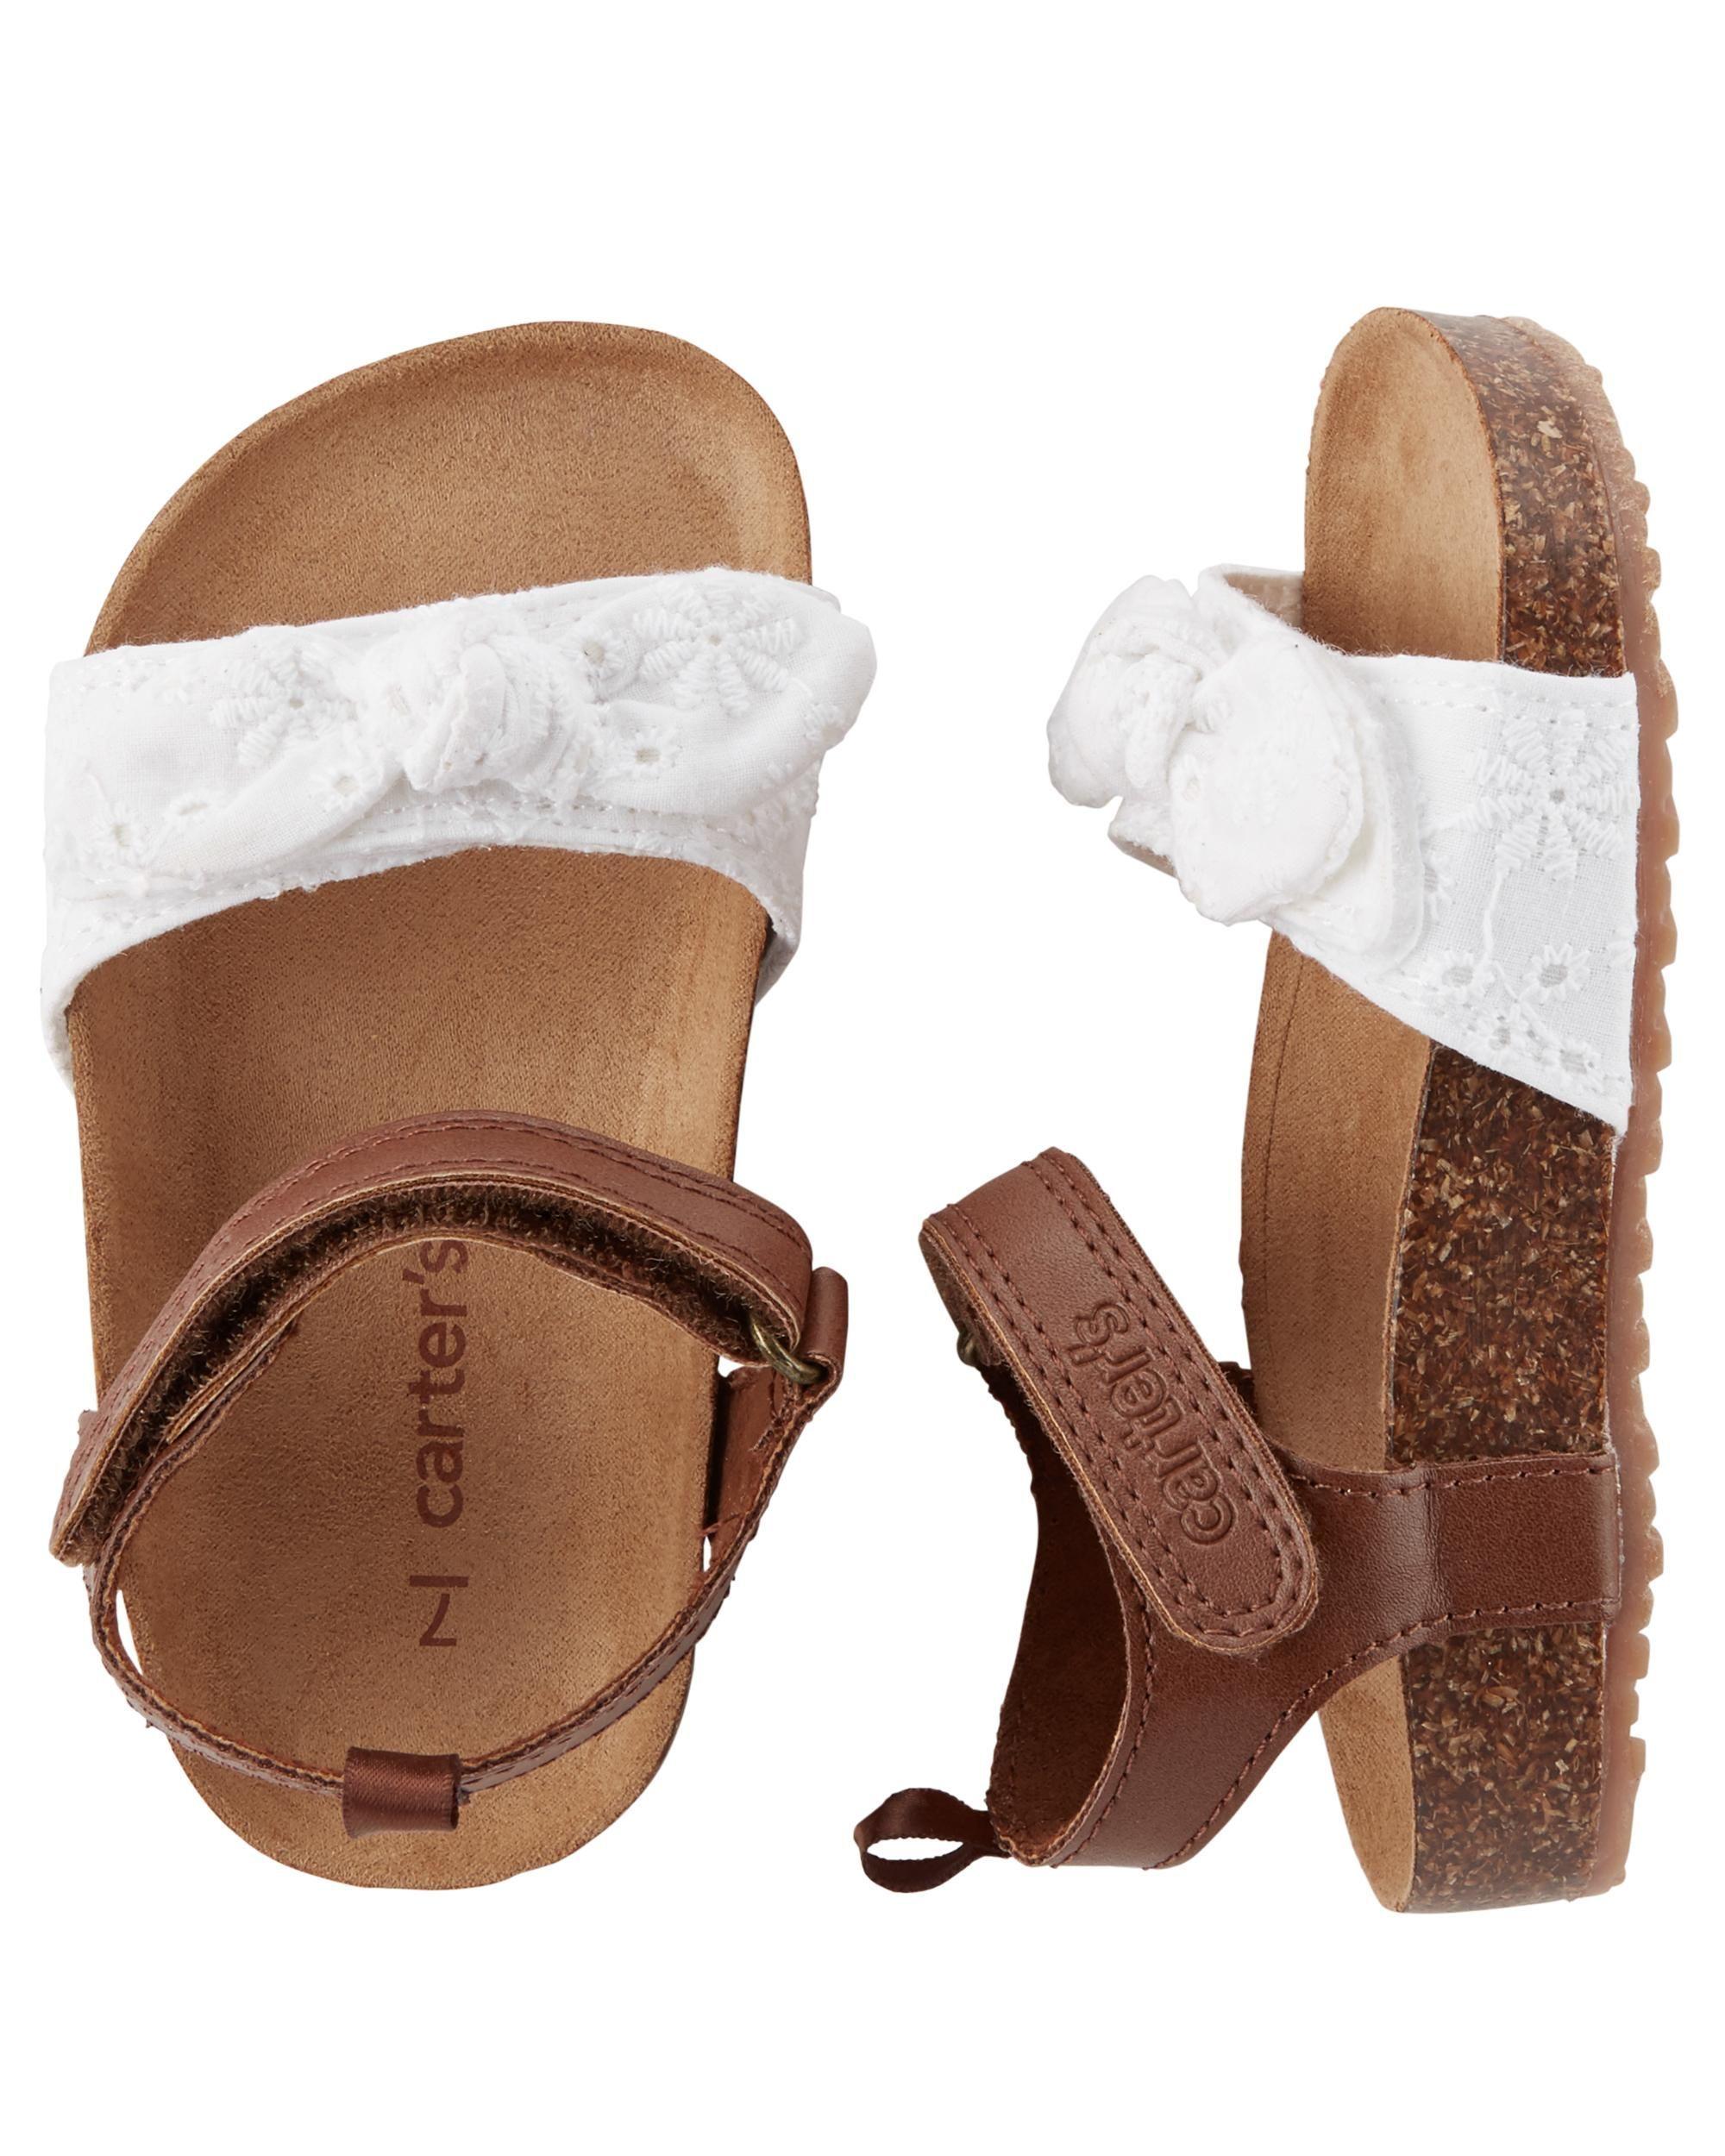 92e2b94cc8db Toddler Girl Carter s Eyelet Cork Sole Sandals